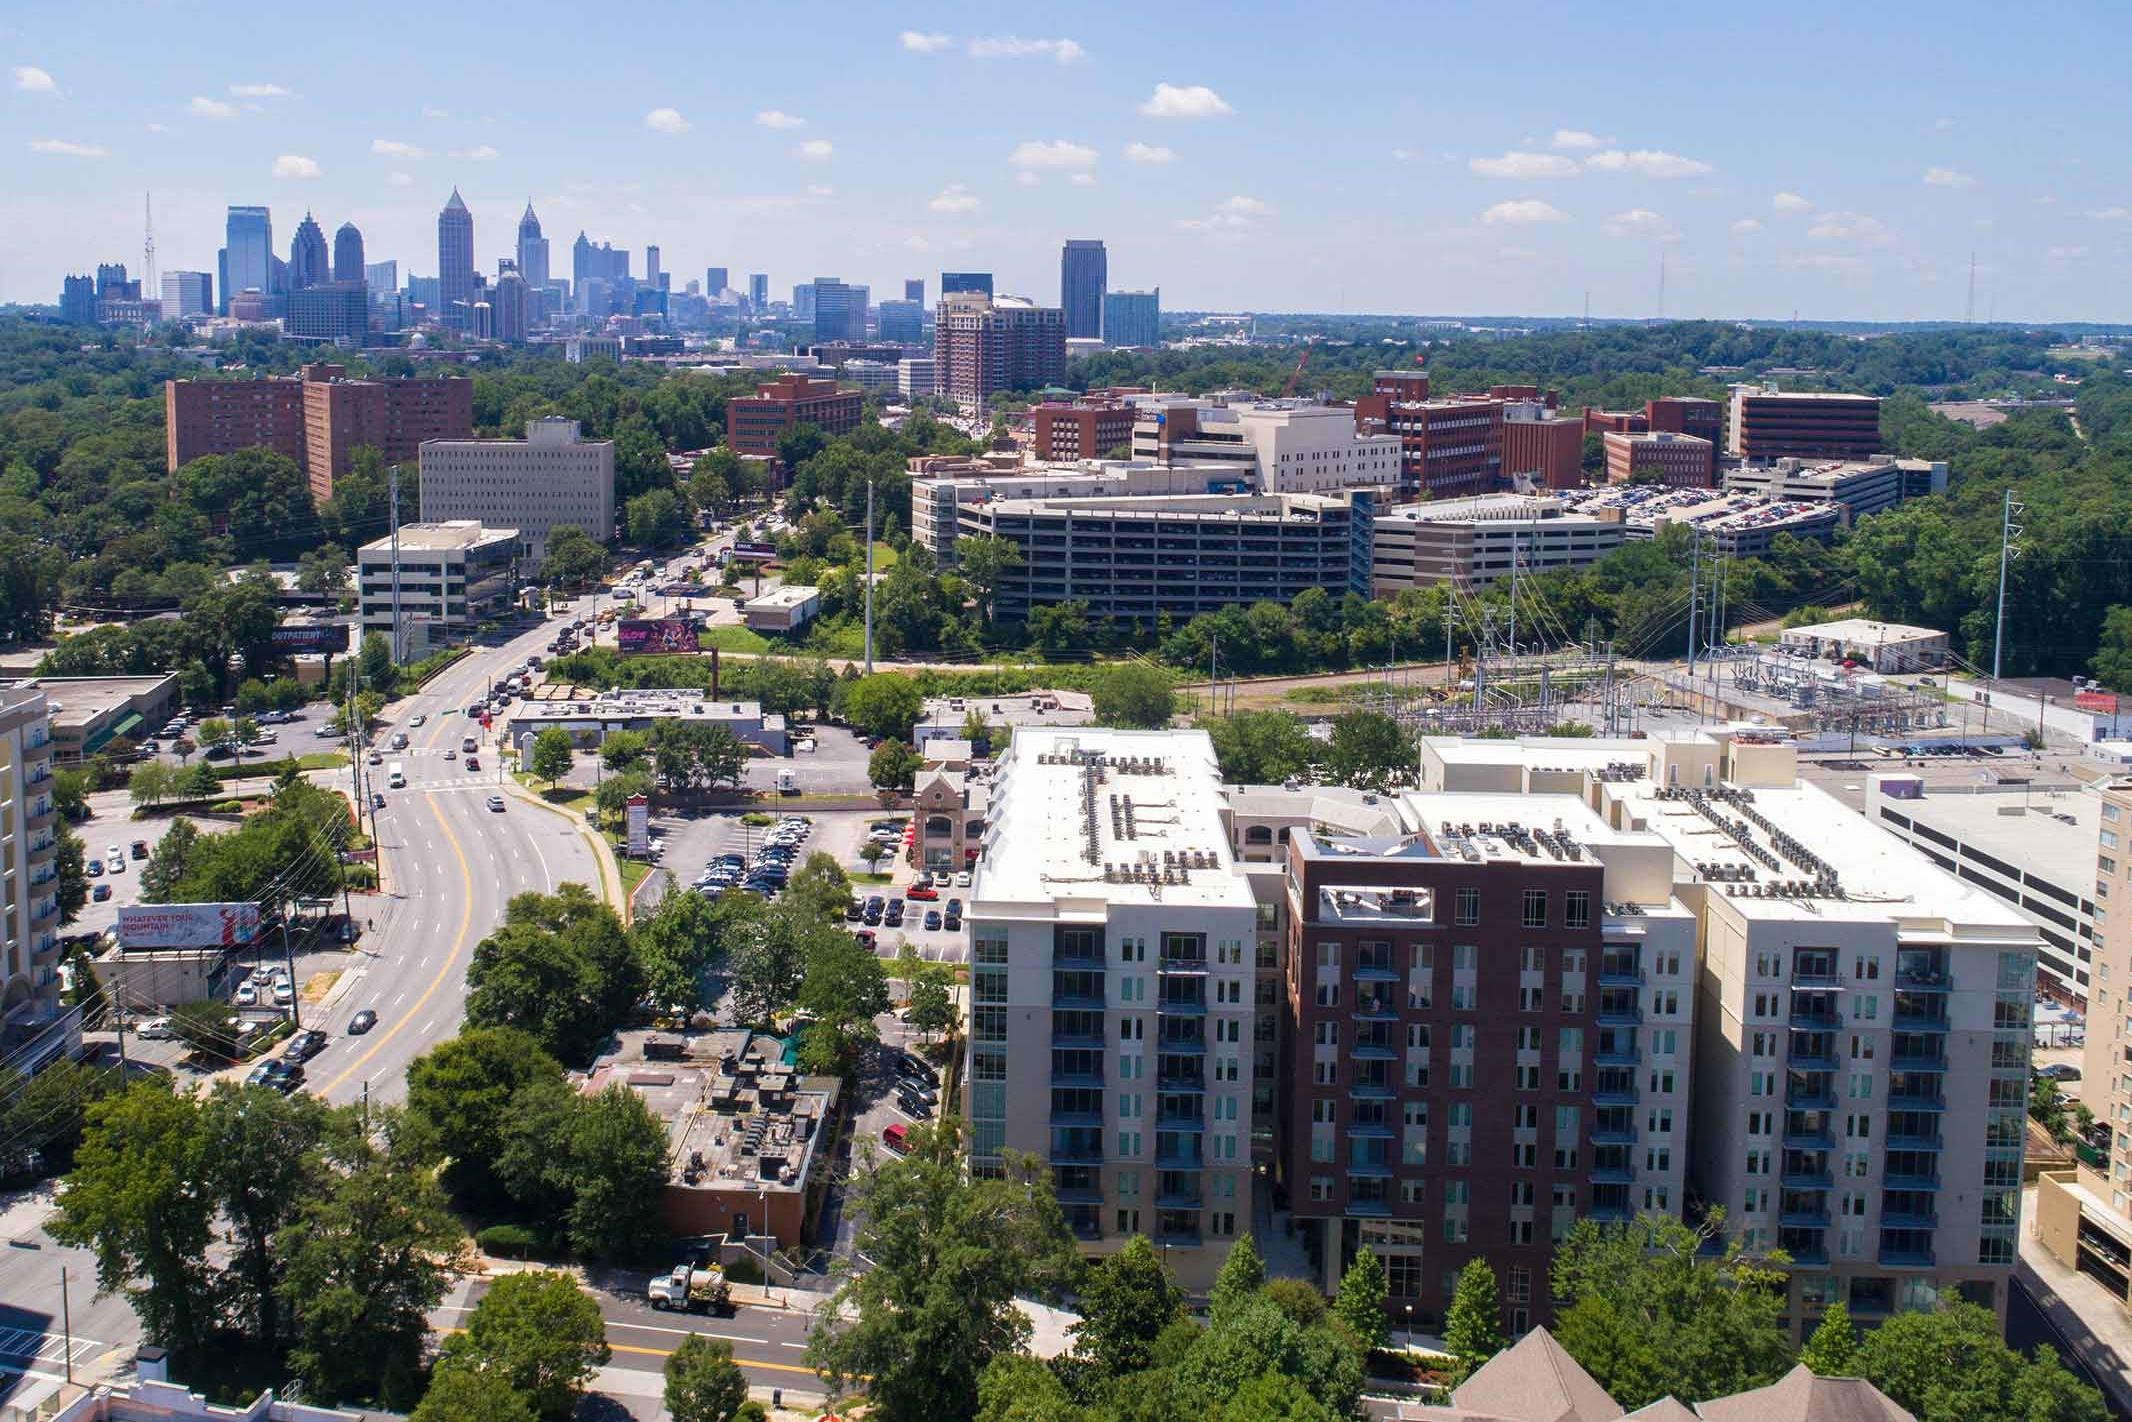 VenueBrookwood_Aerial_Atlanta.jpg